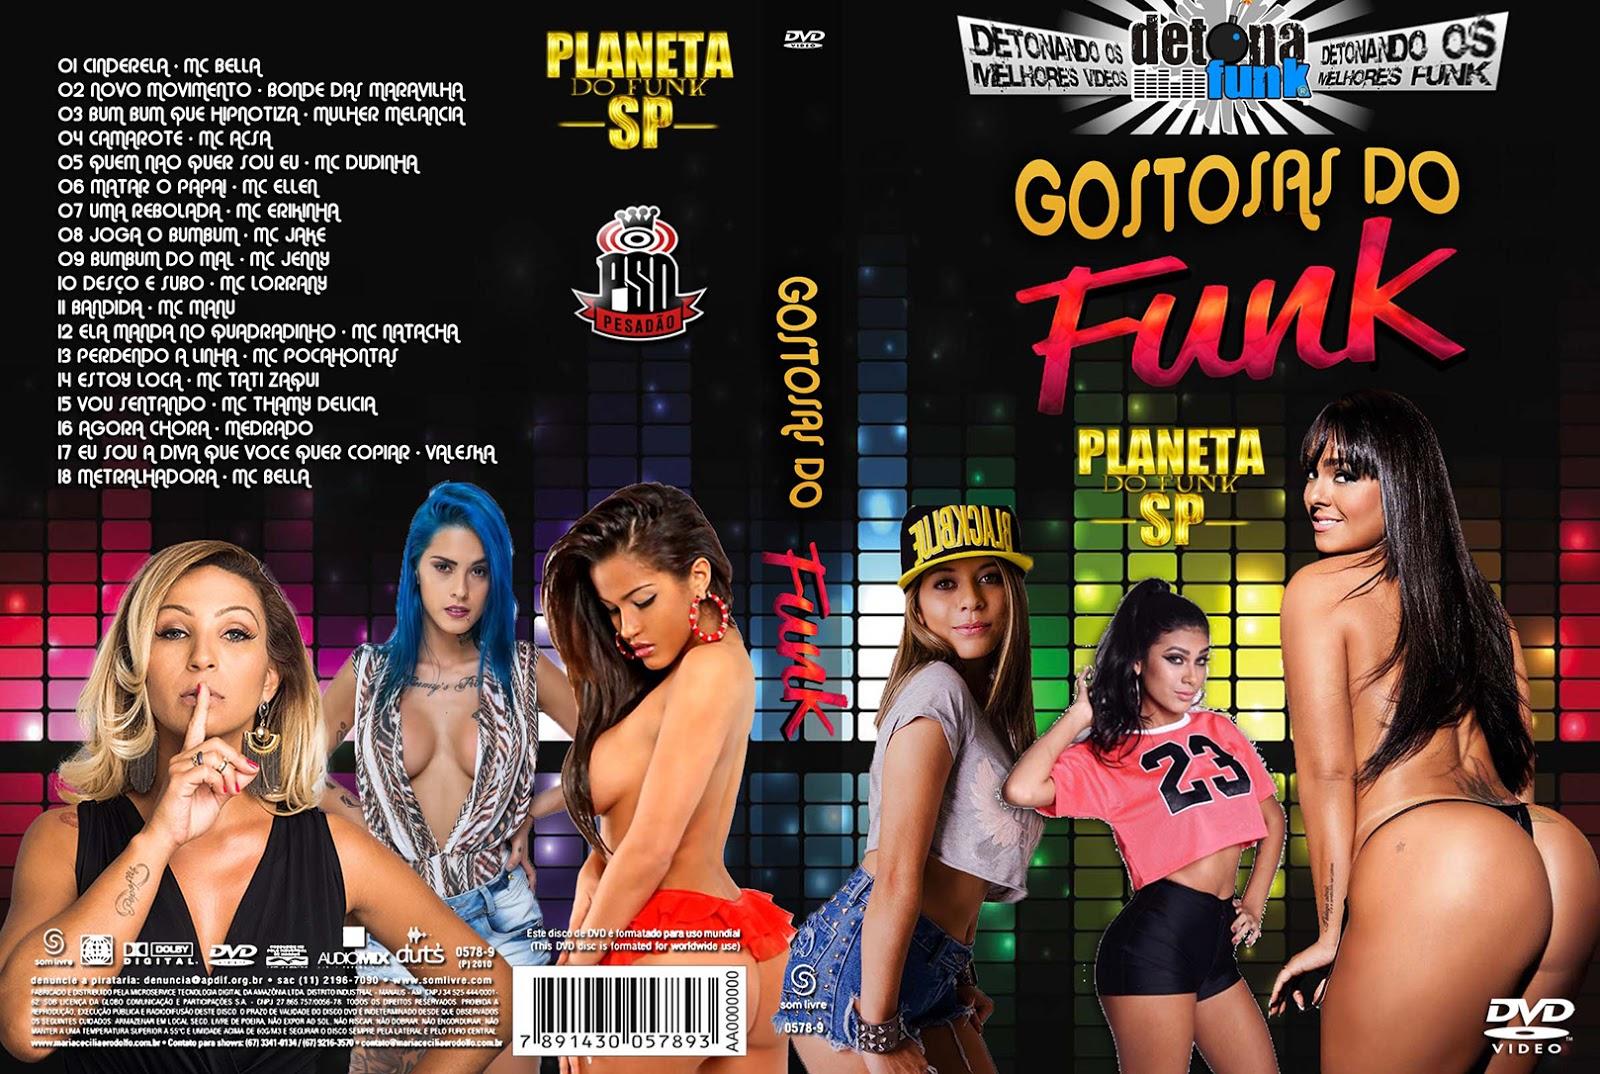 Gostosas do Funk 2016 DVDRip + DVD-R Gostosas 2Bdo 2BFunk 2B2016 2BDVD R 2B  2BXANDAODOWNLOAD